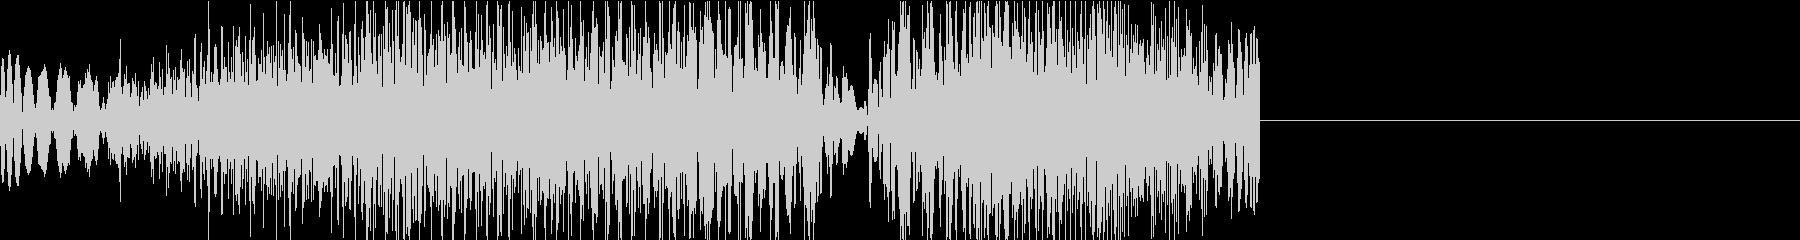 DJプレイ スクラッチ・ノイズ 312の未再生の波形